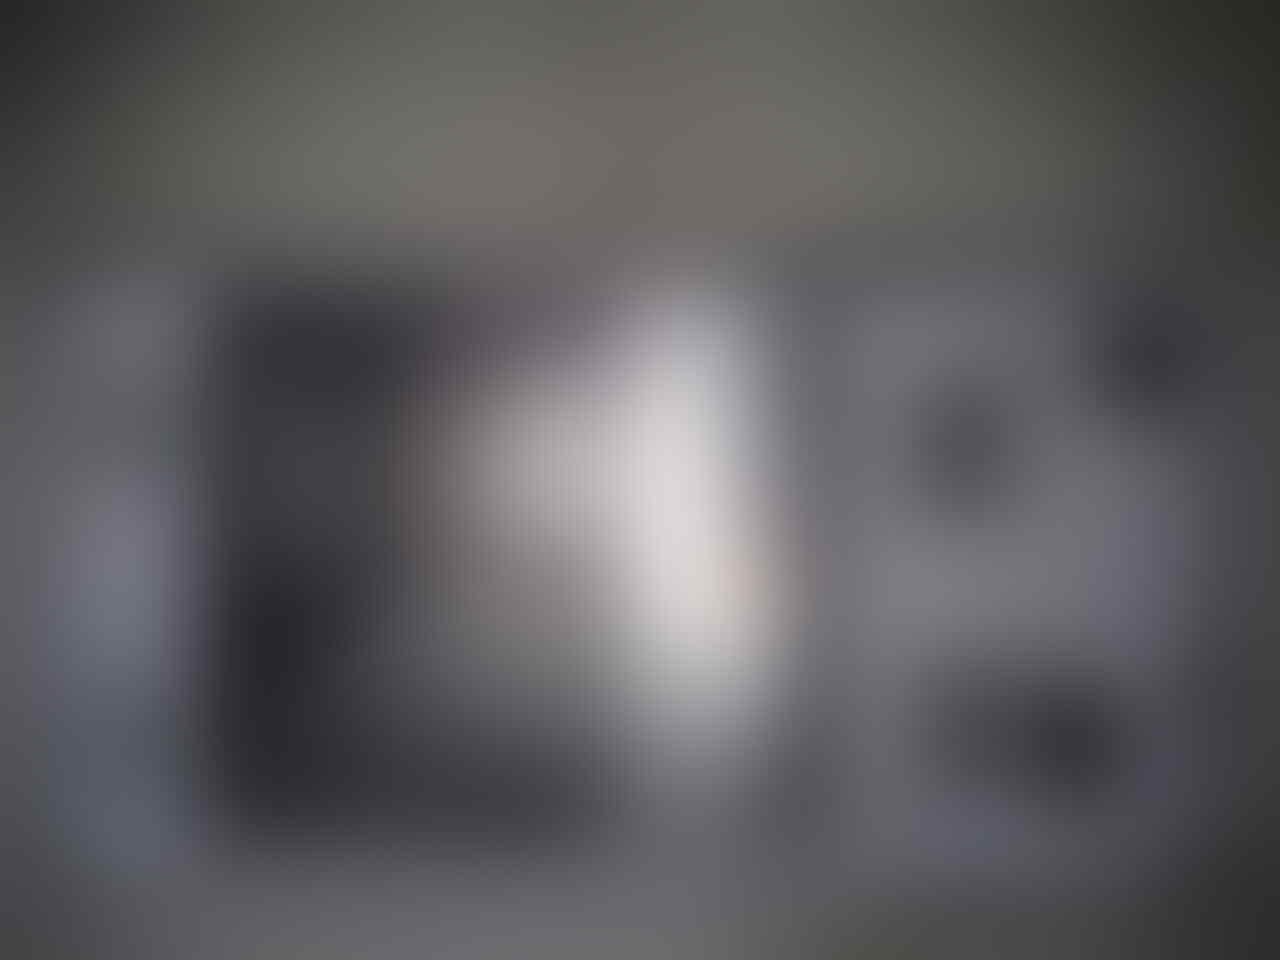 "[WTS]Cross A27 android 5,8"" spek mantap (Depok)"